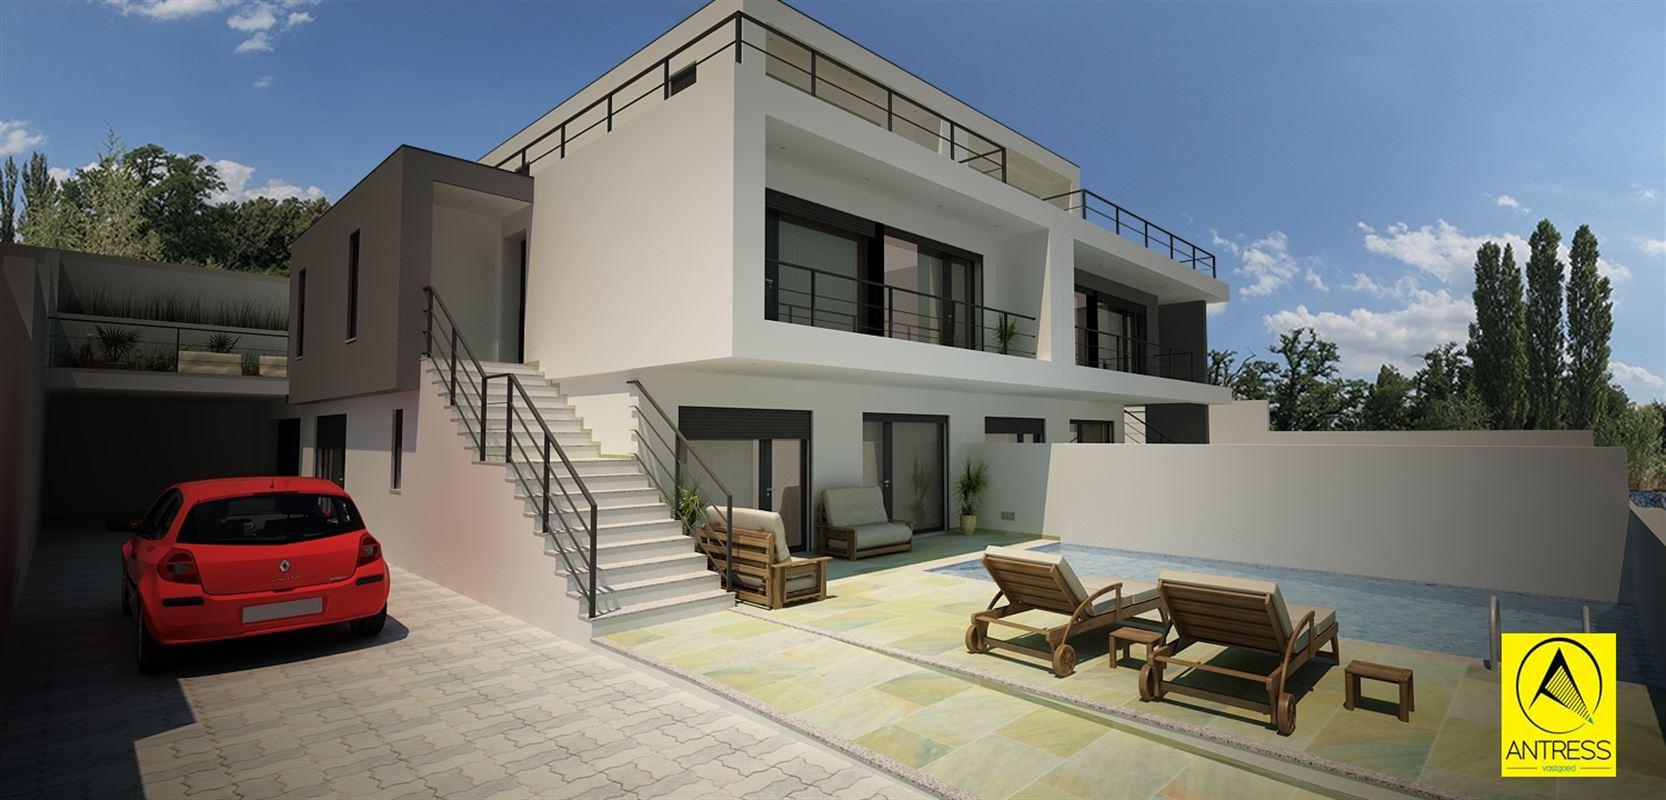 Foto 3 : Villa te 2530 Lourinhã (Portugal) - Prijs € 340.000